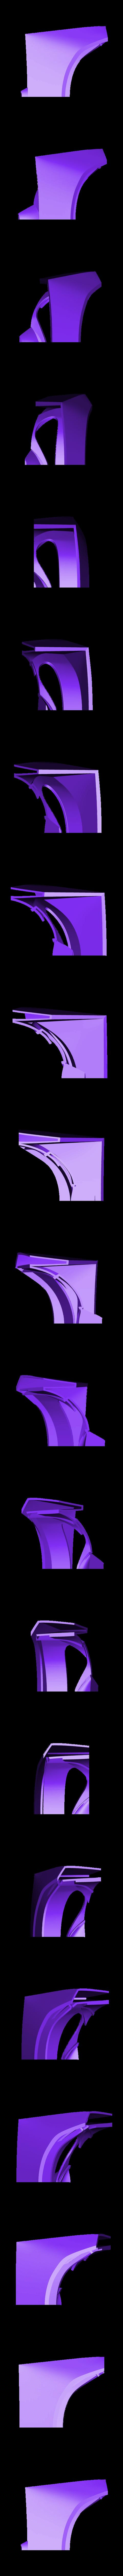 Part 6 v1.stl Download STL file ARF Trooper Helmet • 3D print object, VillainousPropShop